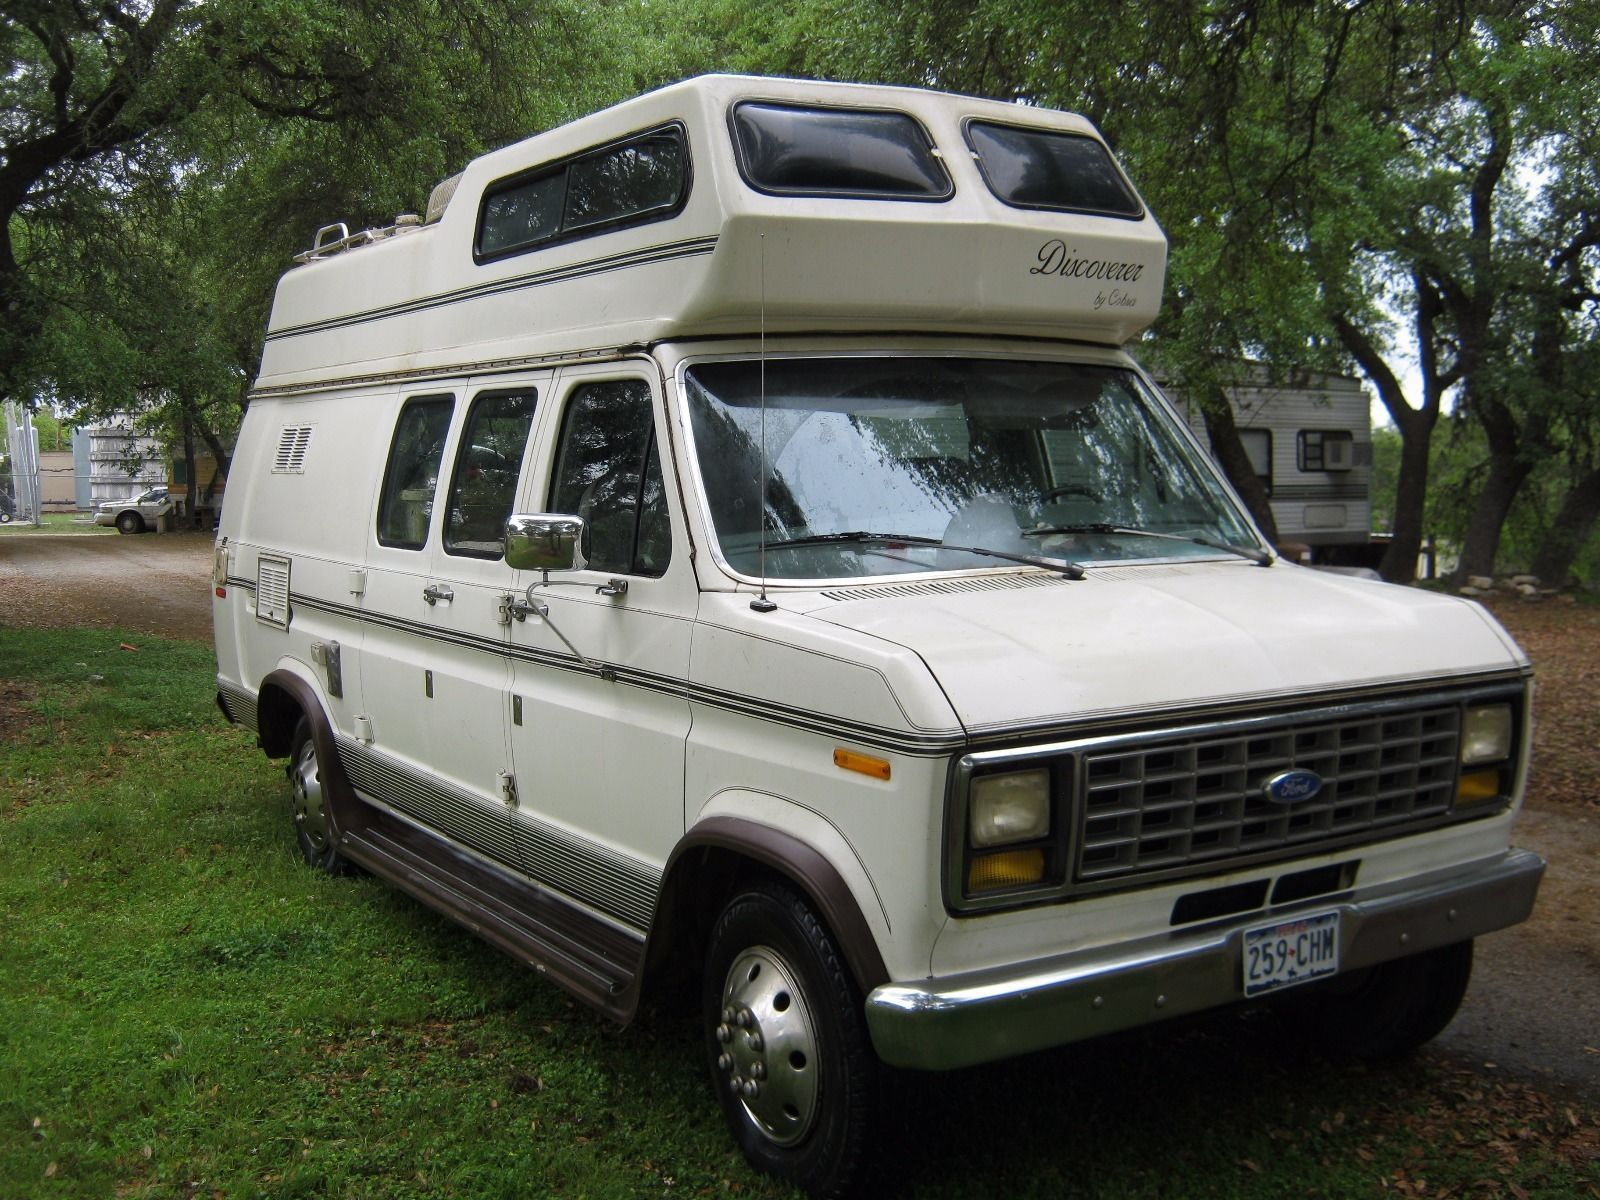 1991 Canyonlake Tx 2 Campers For Sale Canyon Lake Canyon Lake Texas